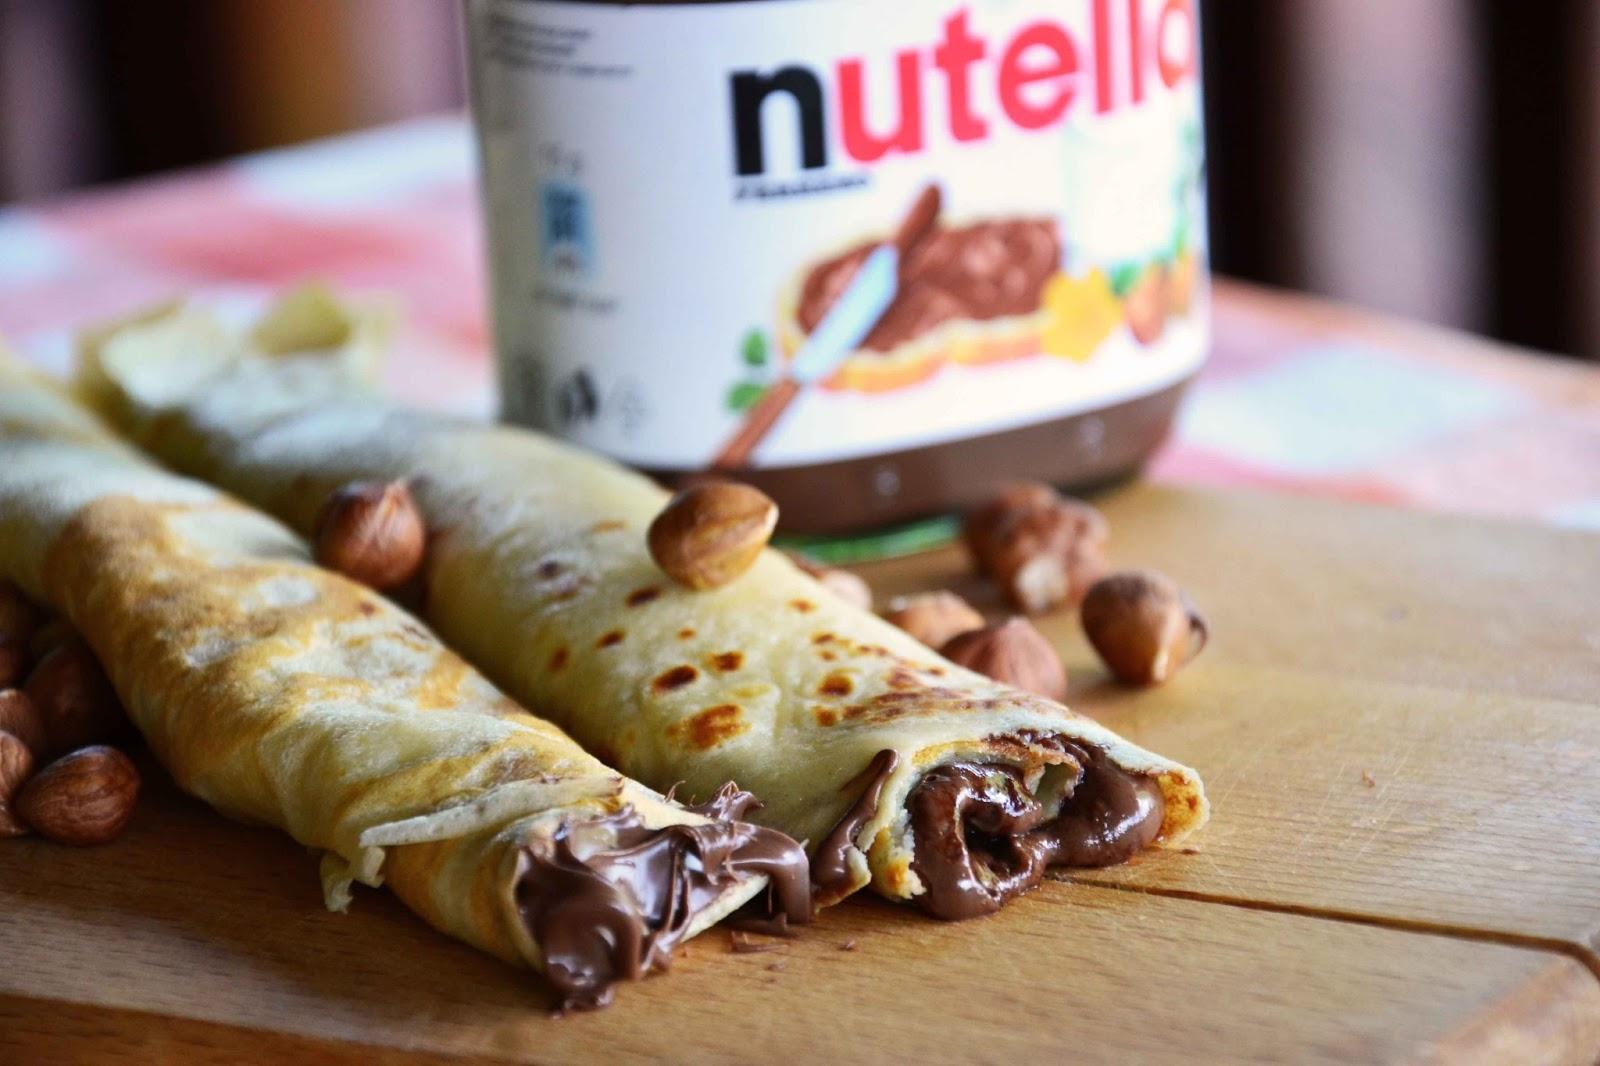 The Eccentric Cook Nutella Stuffed Crepes